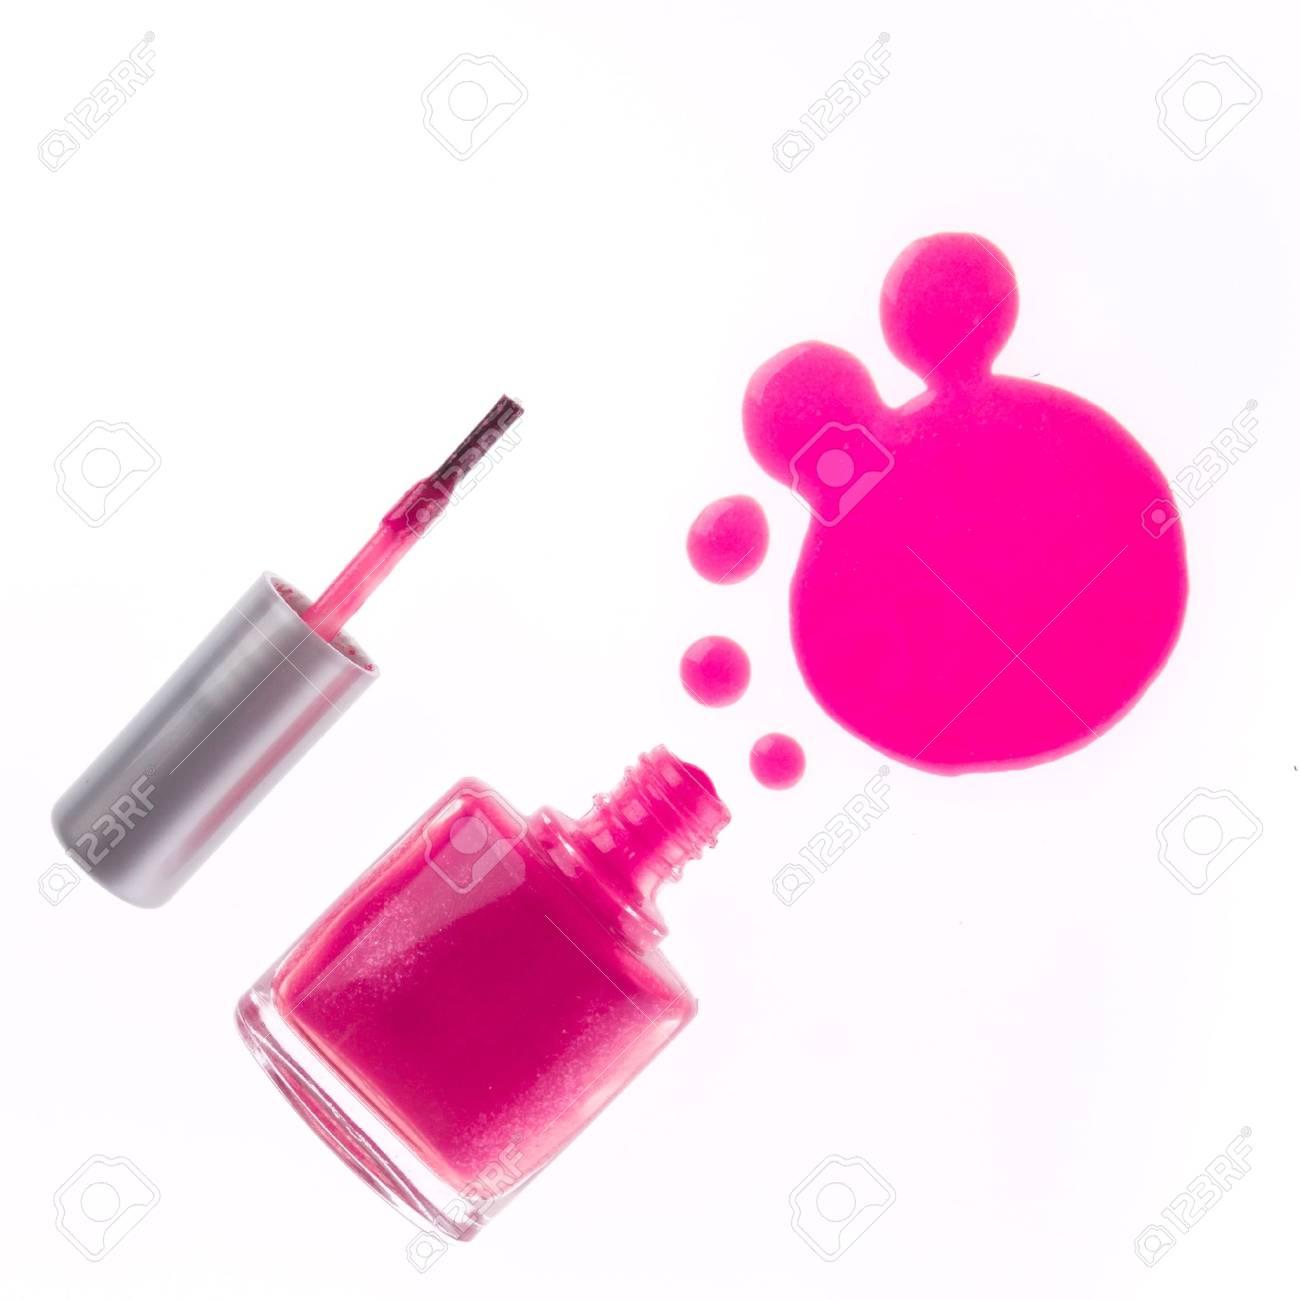 spilled pink nail polish isolated on white background Stock Photo - 13646613